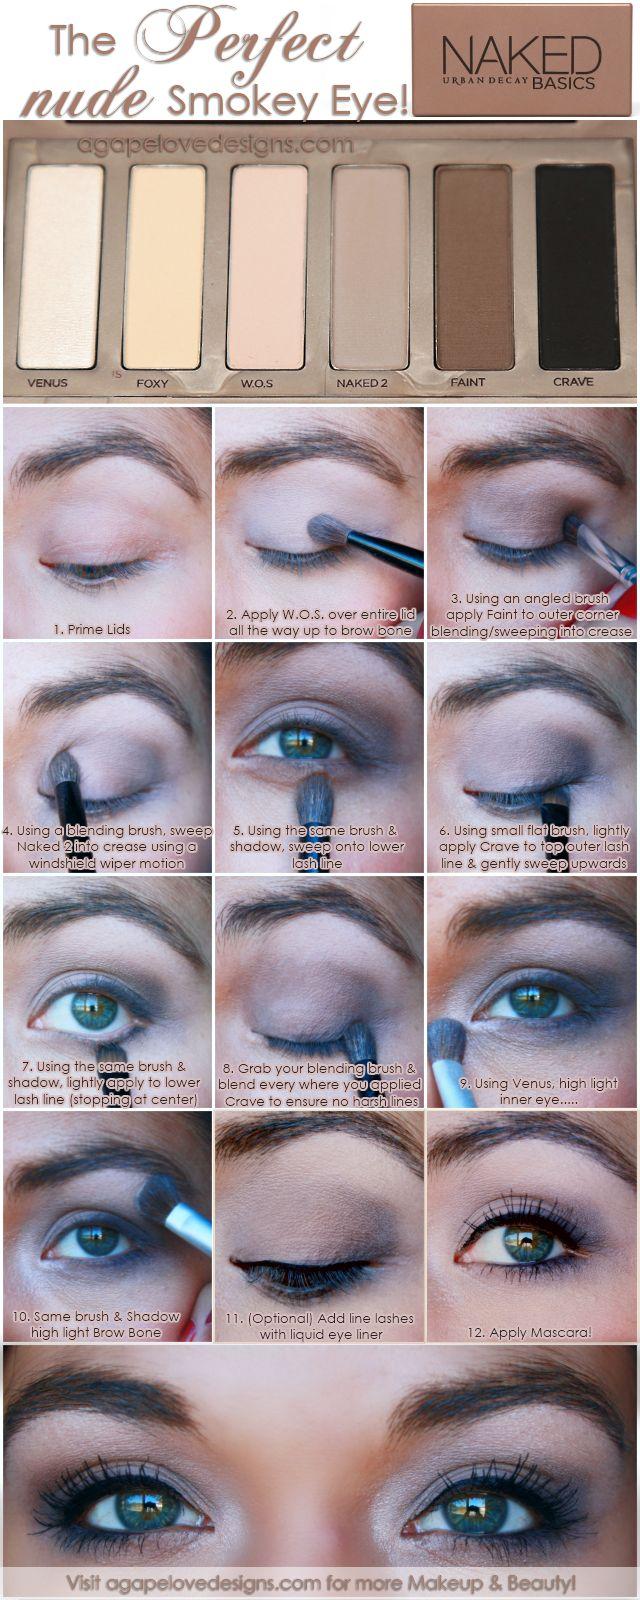 5 Maquillage chic